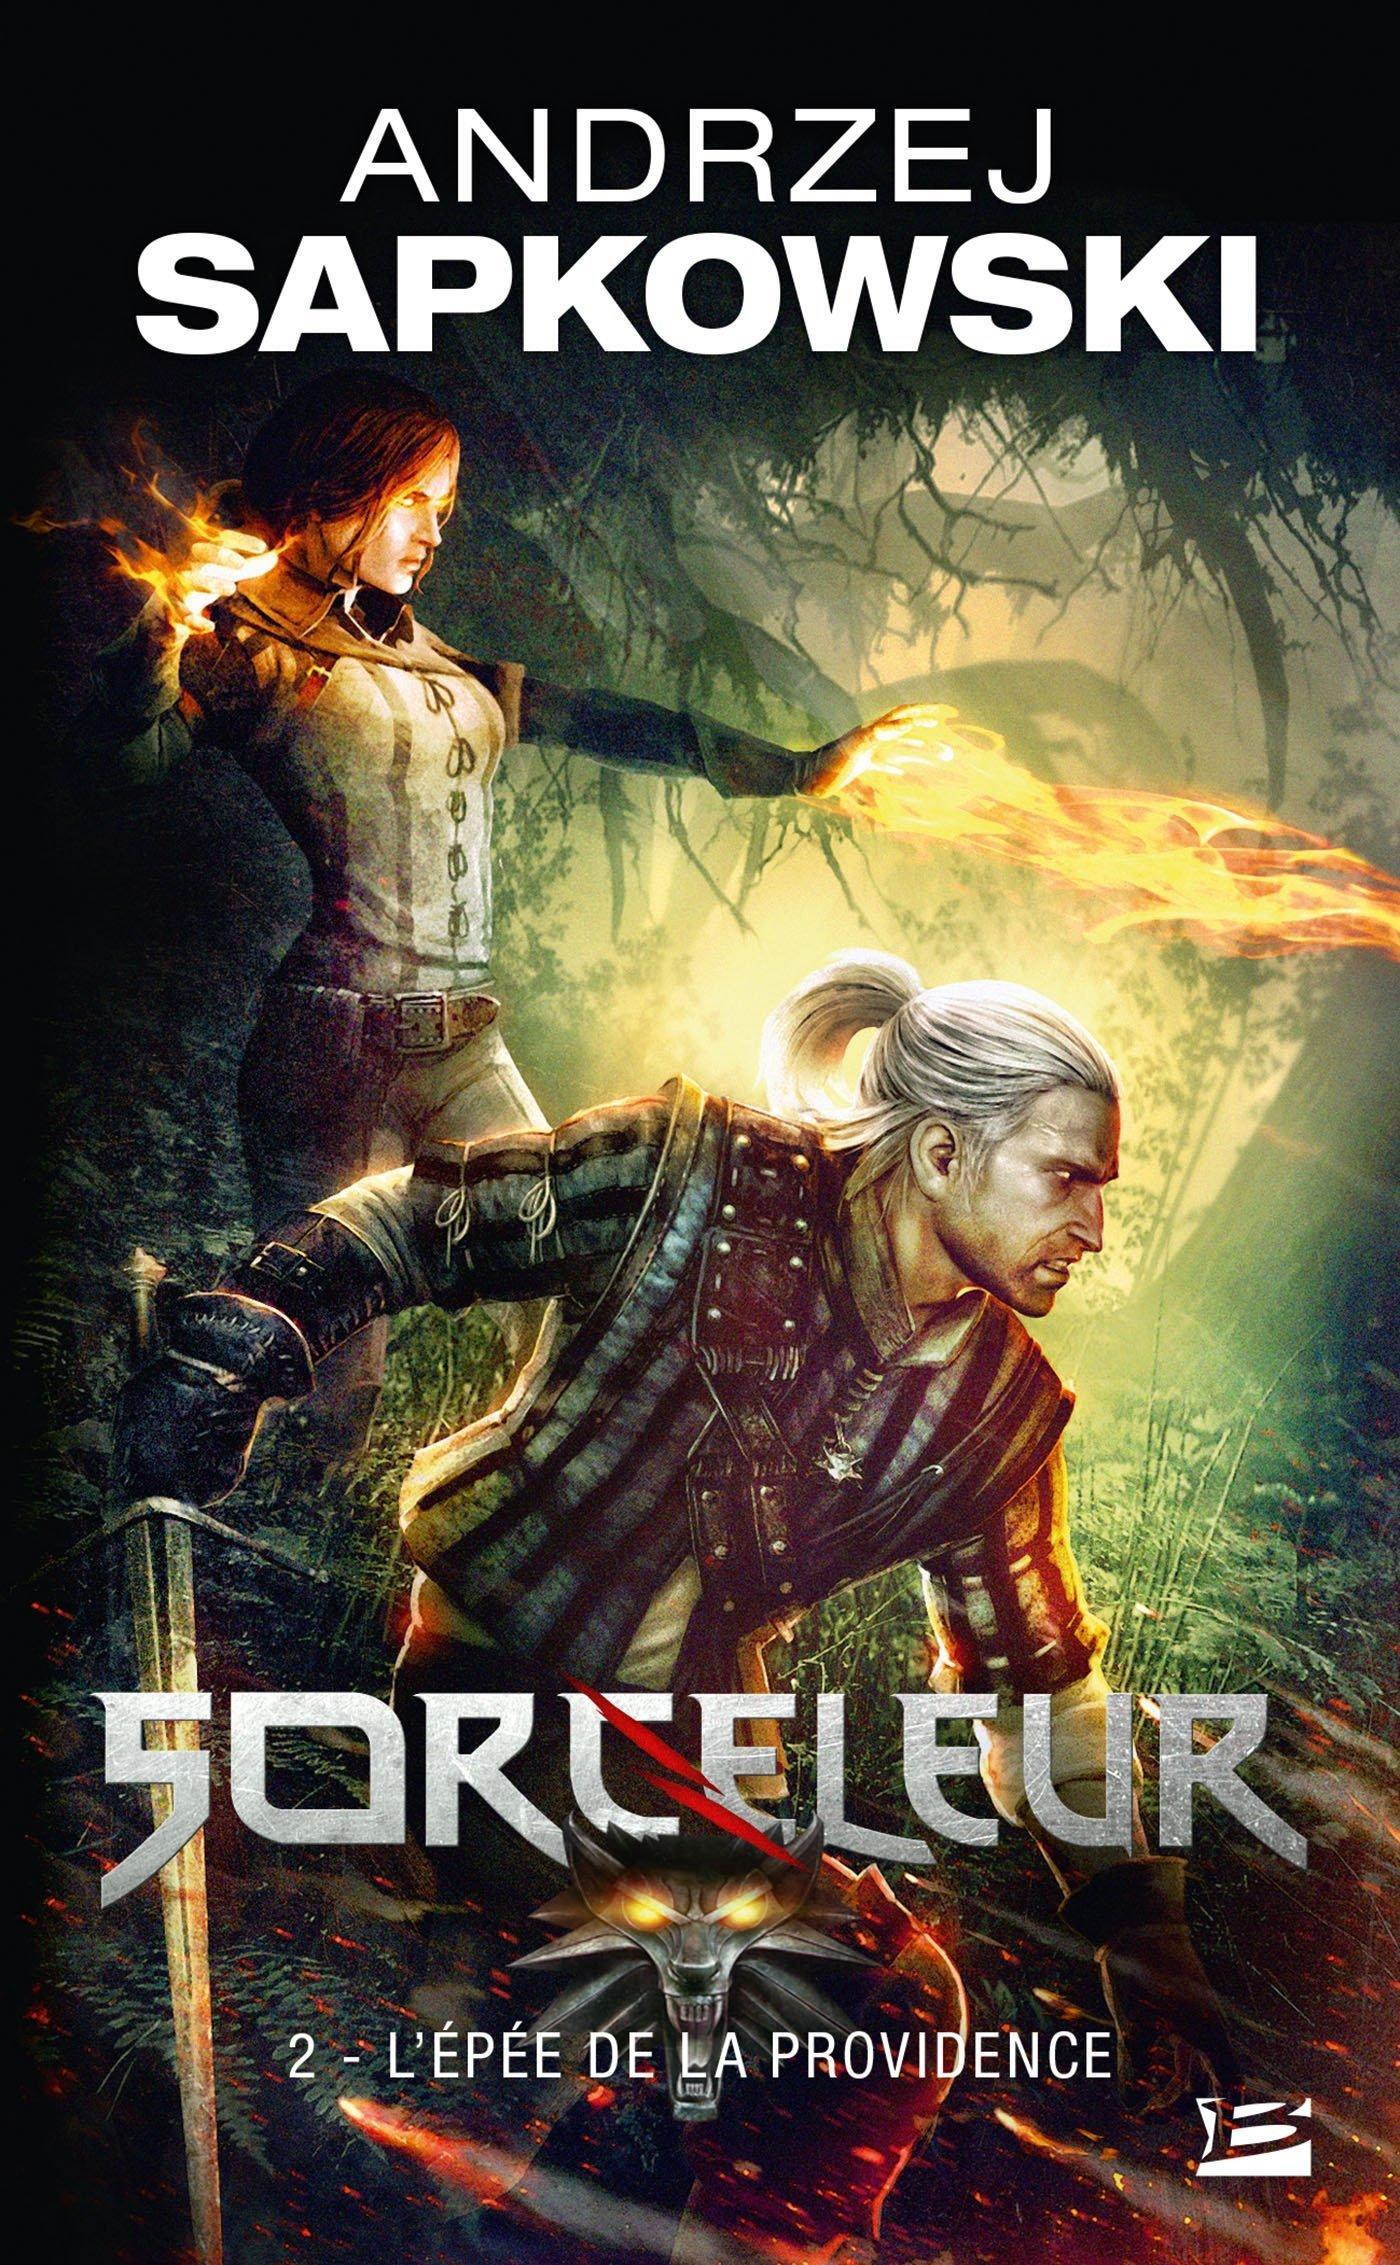 Sorceleur, Tome 2: L'Épée de la providence Poche – 19 mai 2011 Andrzej Sapkowski Bragelonne 2811205071 Fantasy